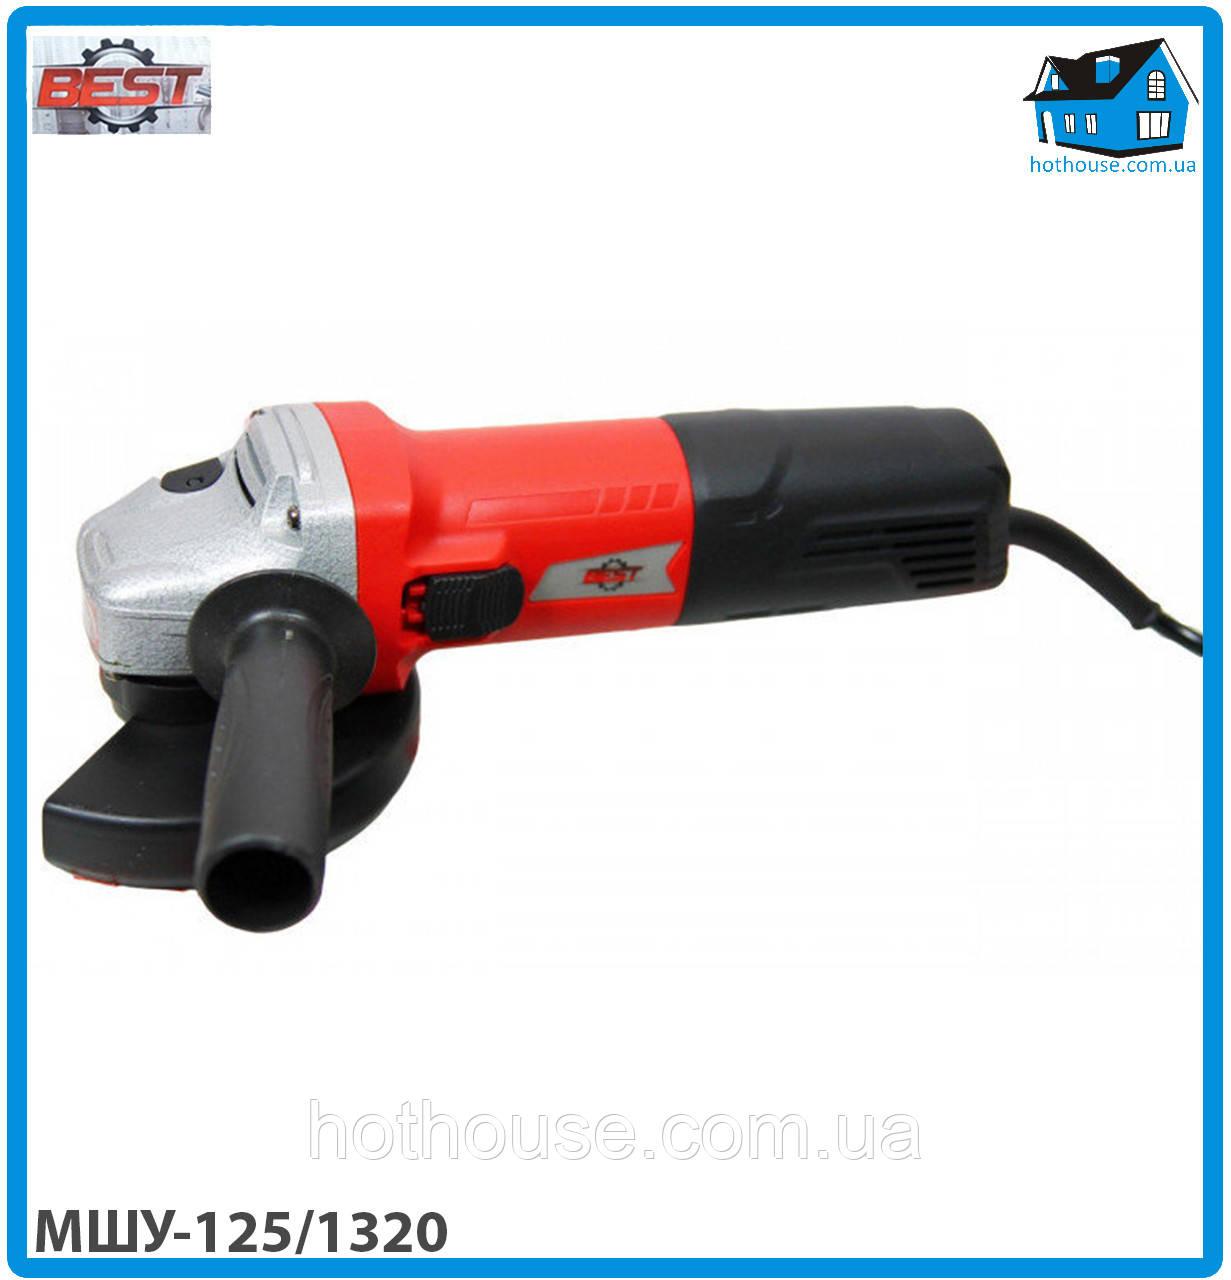 Углошлифовальная машина (болгарка) BEST МШУ-125/1320